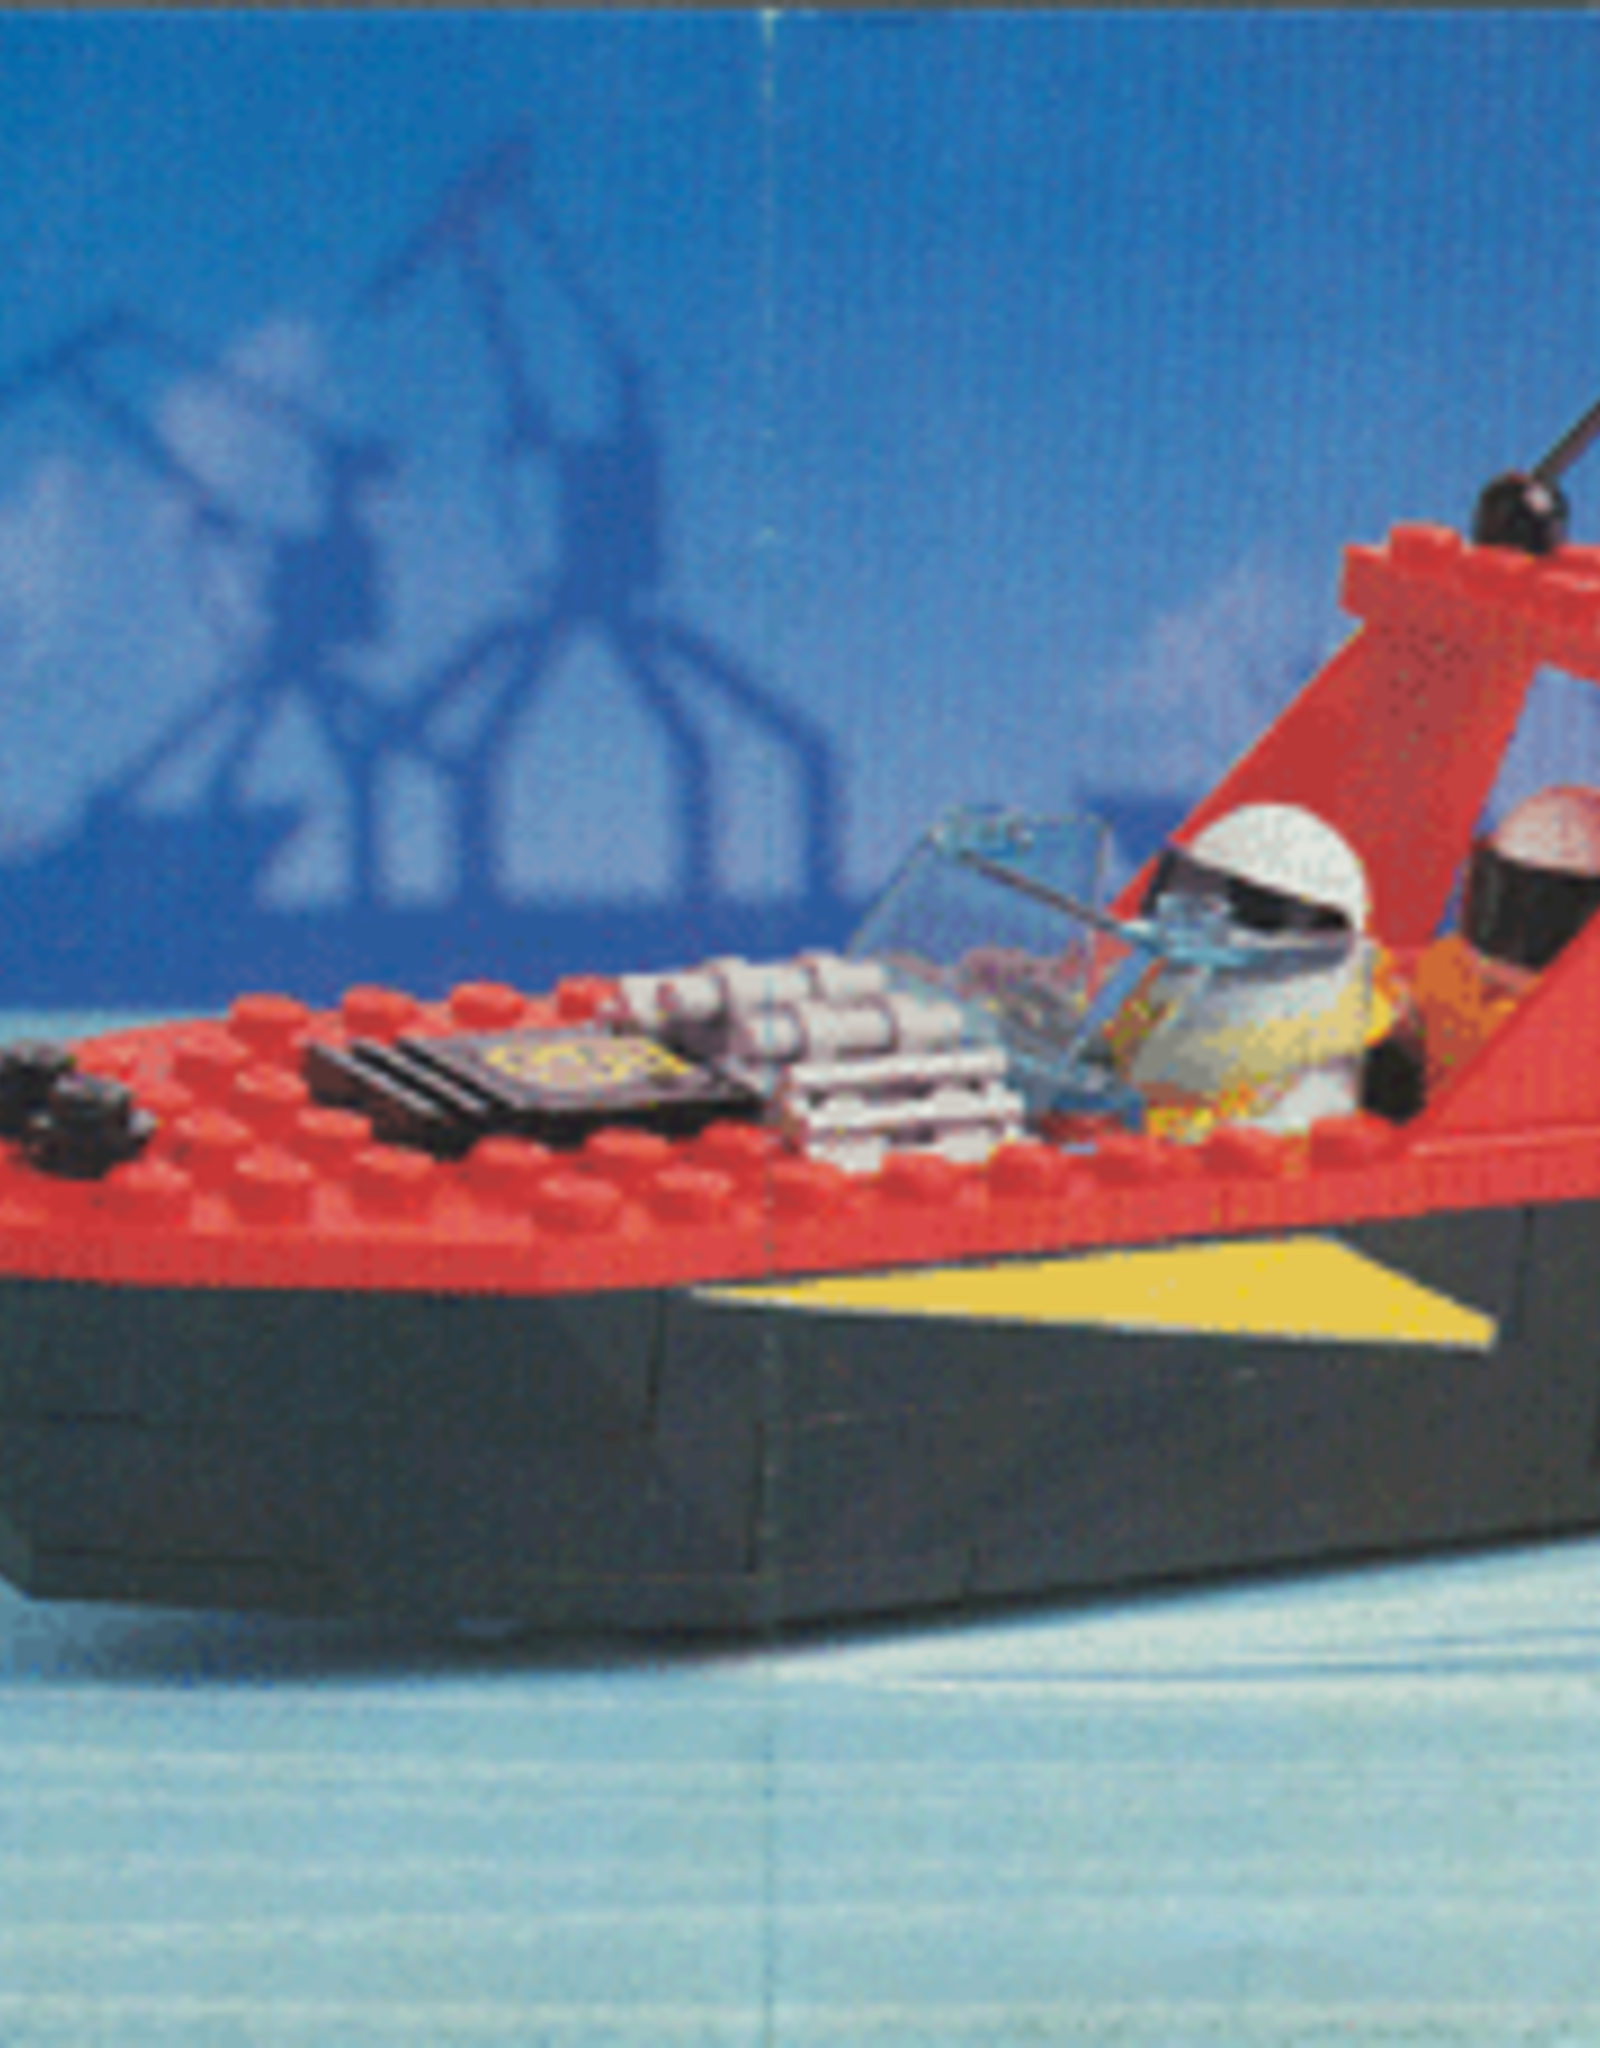 LEGO LEGO 6679 Dark Shark - Harbor